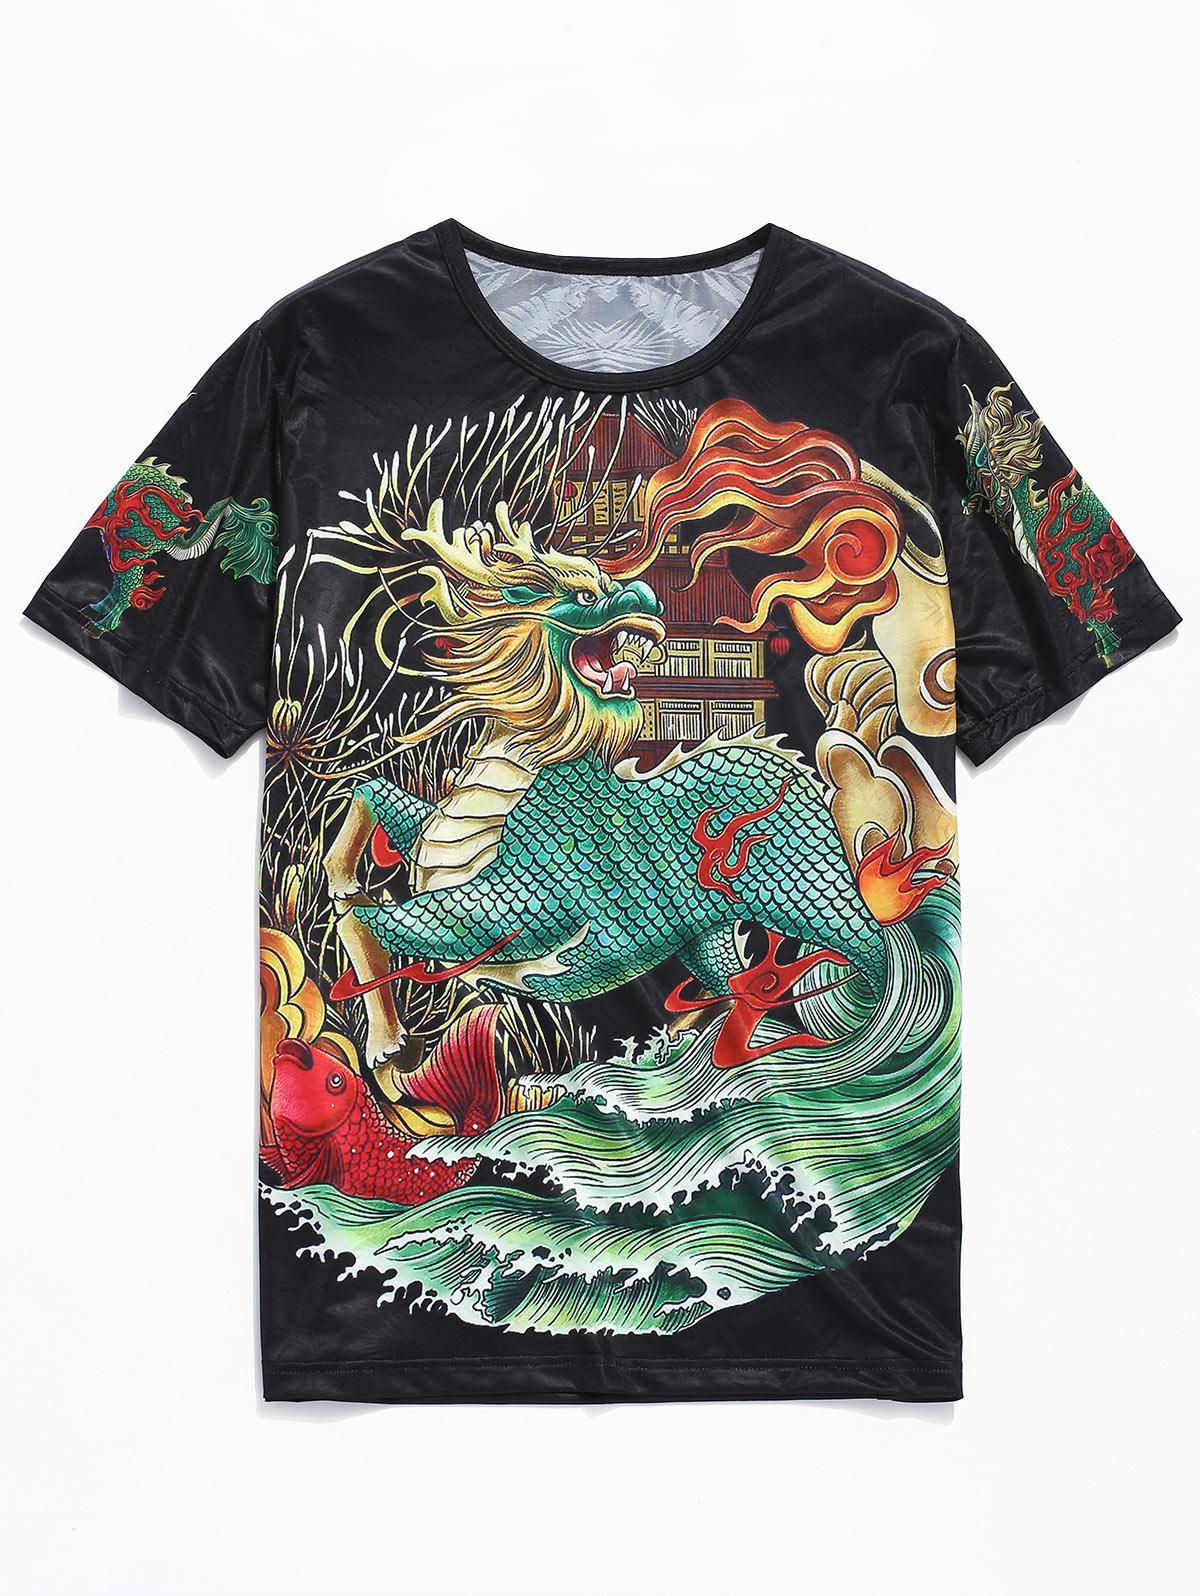 Animal Printed Casual T-shirt